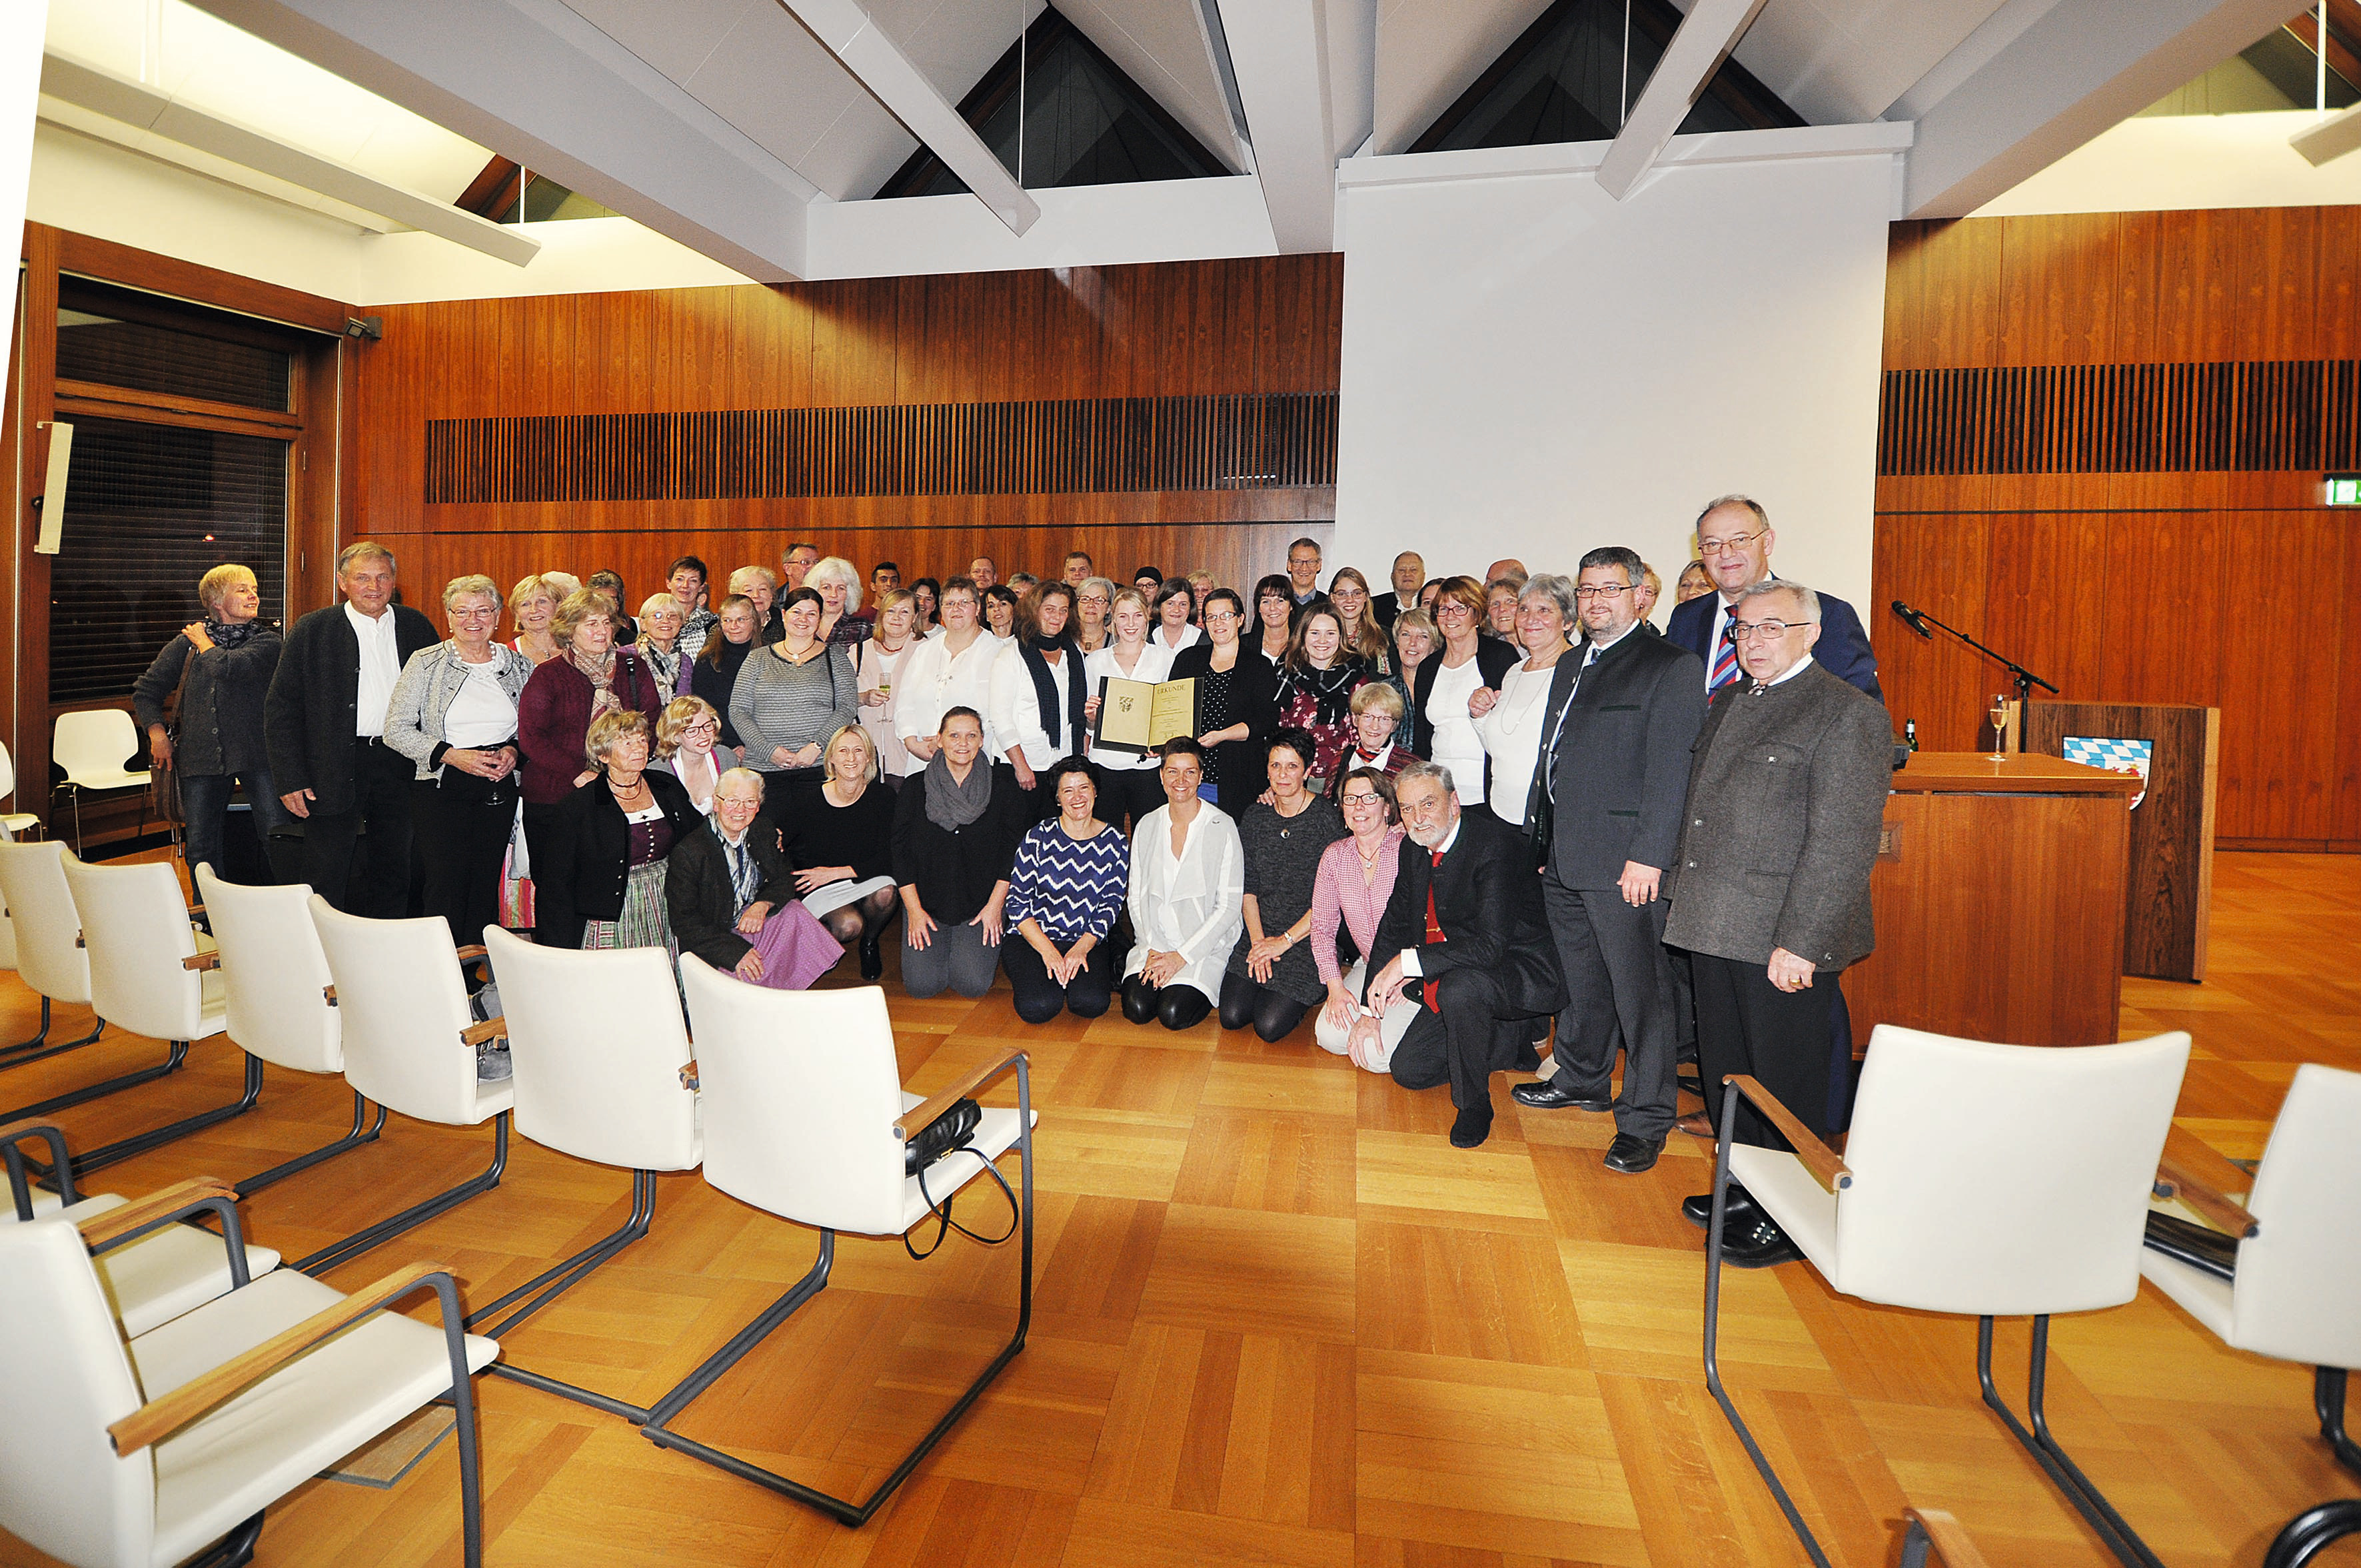 TT_Sozialpreis Lkrs Ro an CSW Foto S.Faltner